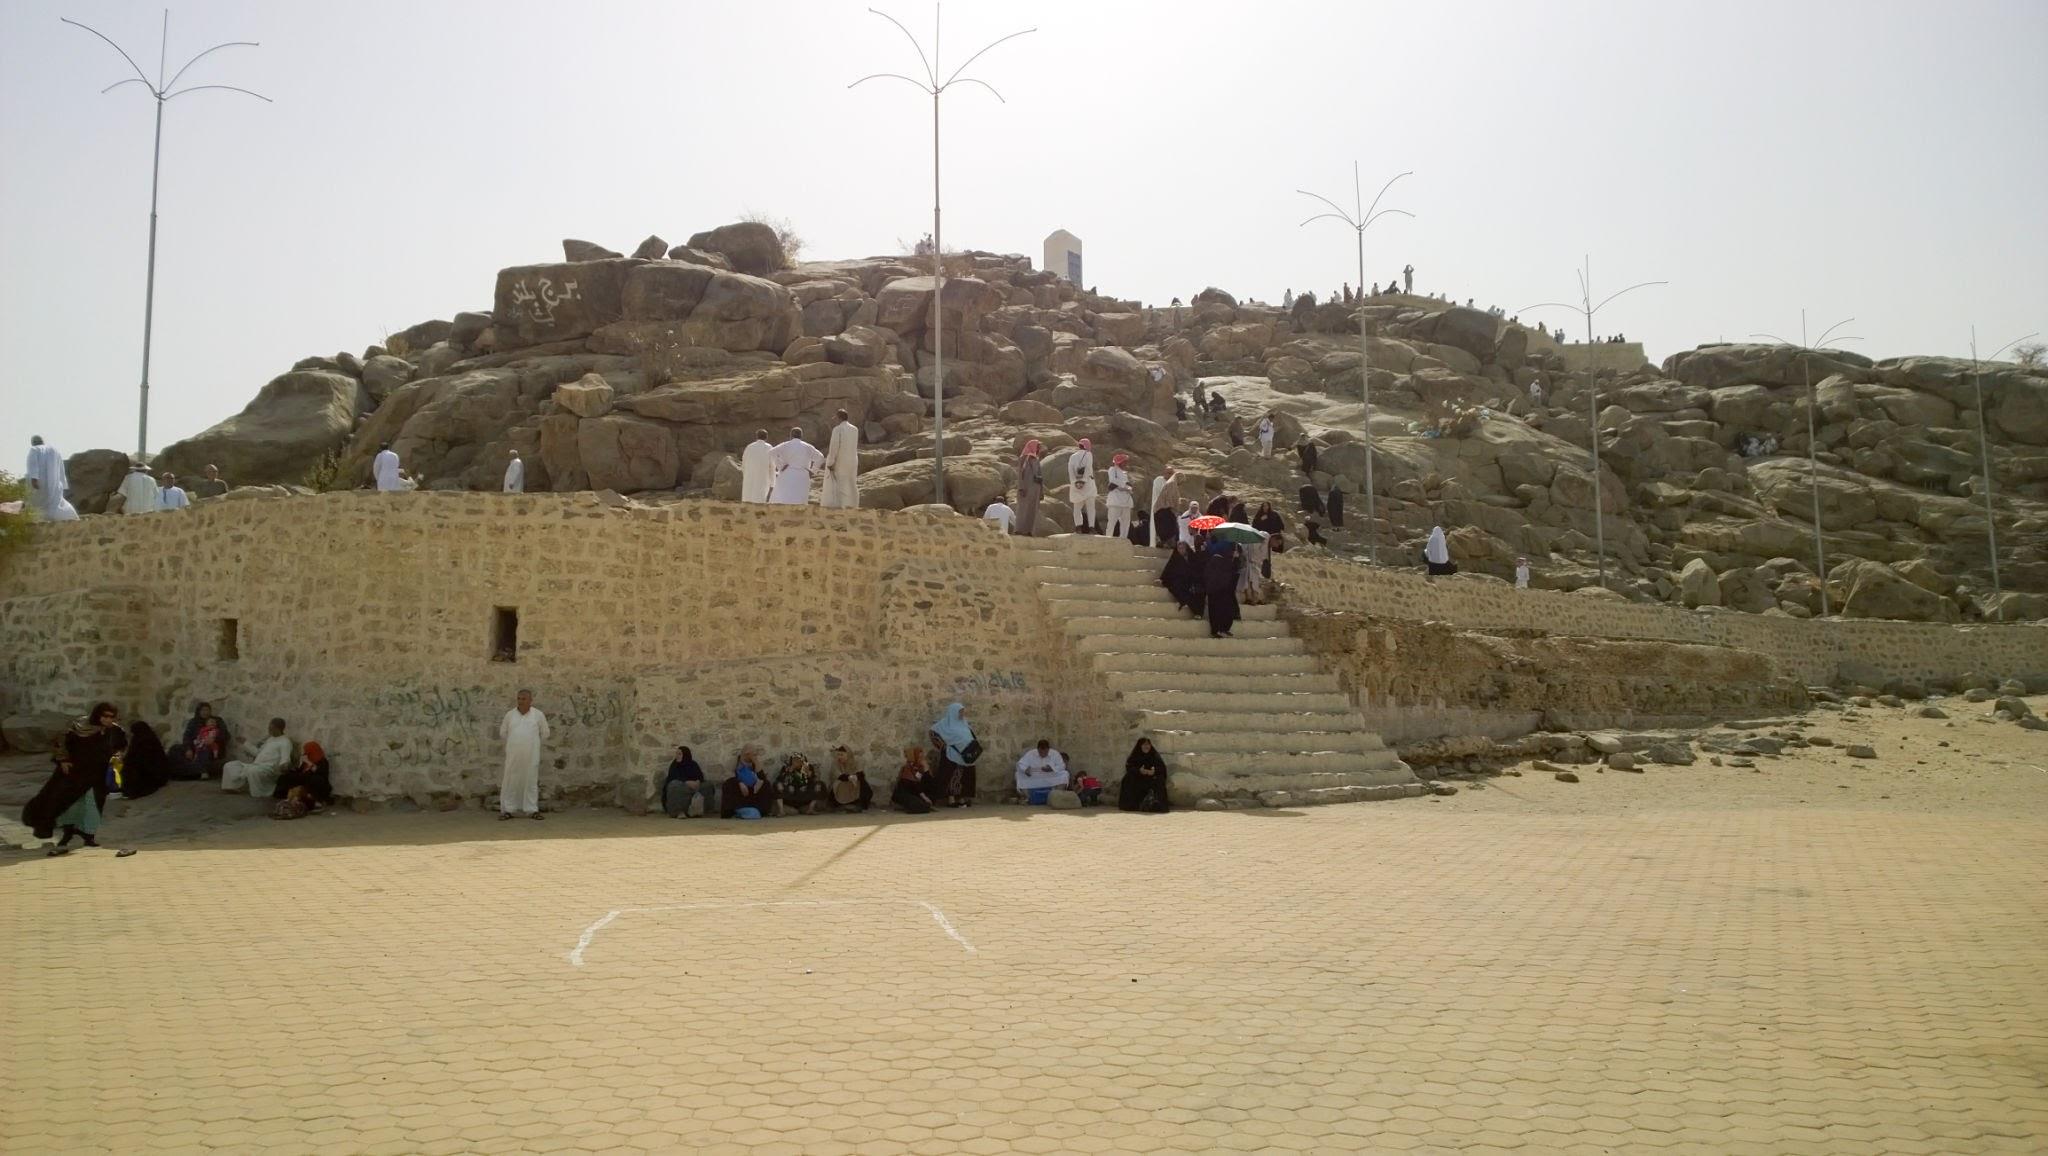 Arafat - Worship Ground